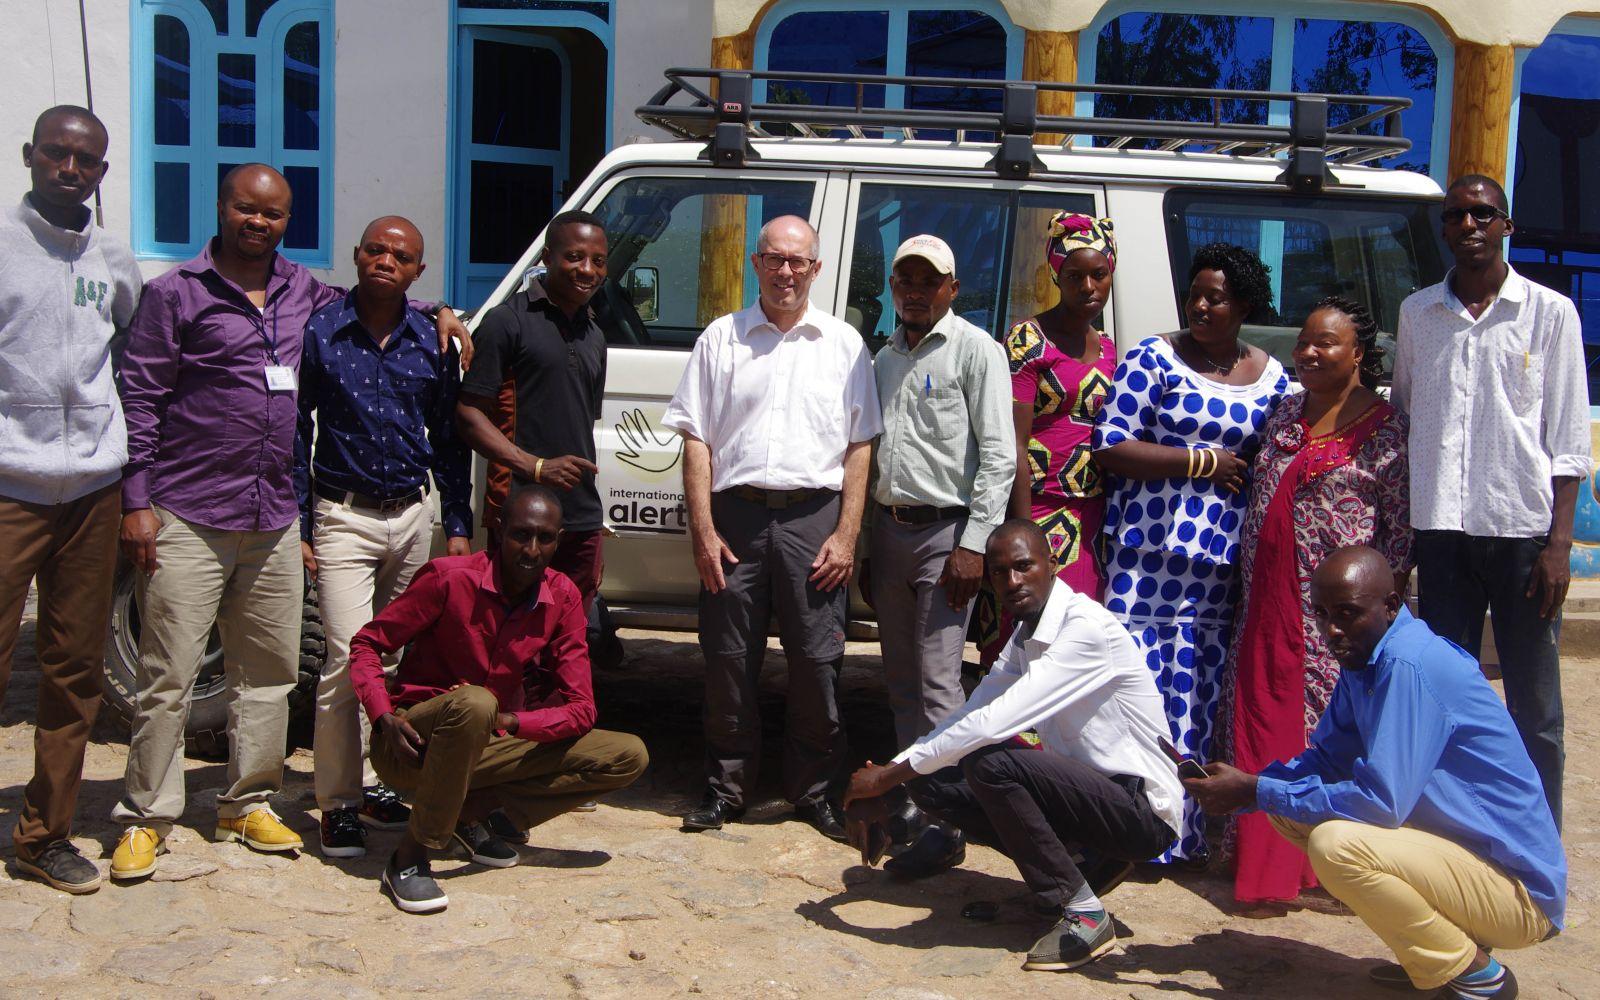 Leadership social et humanitaire